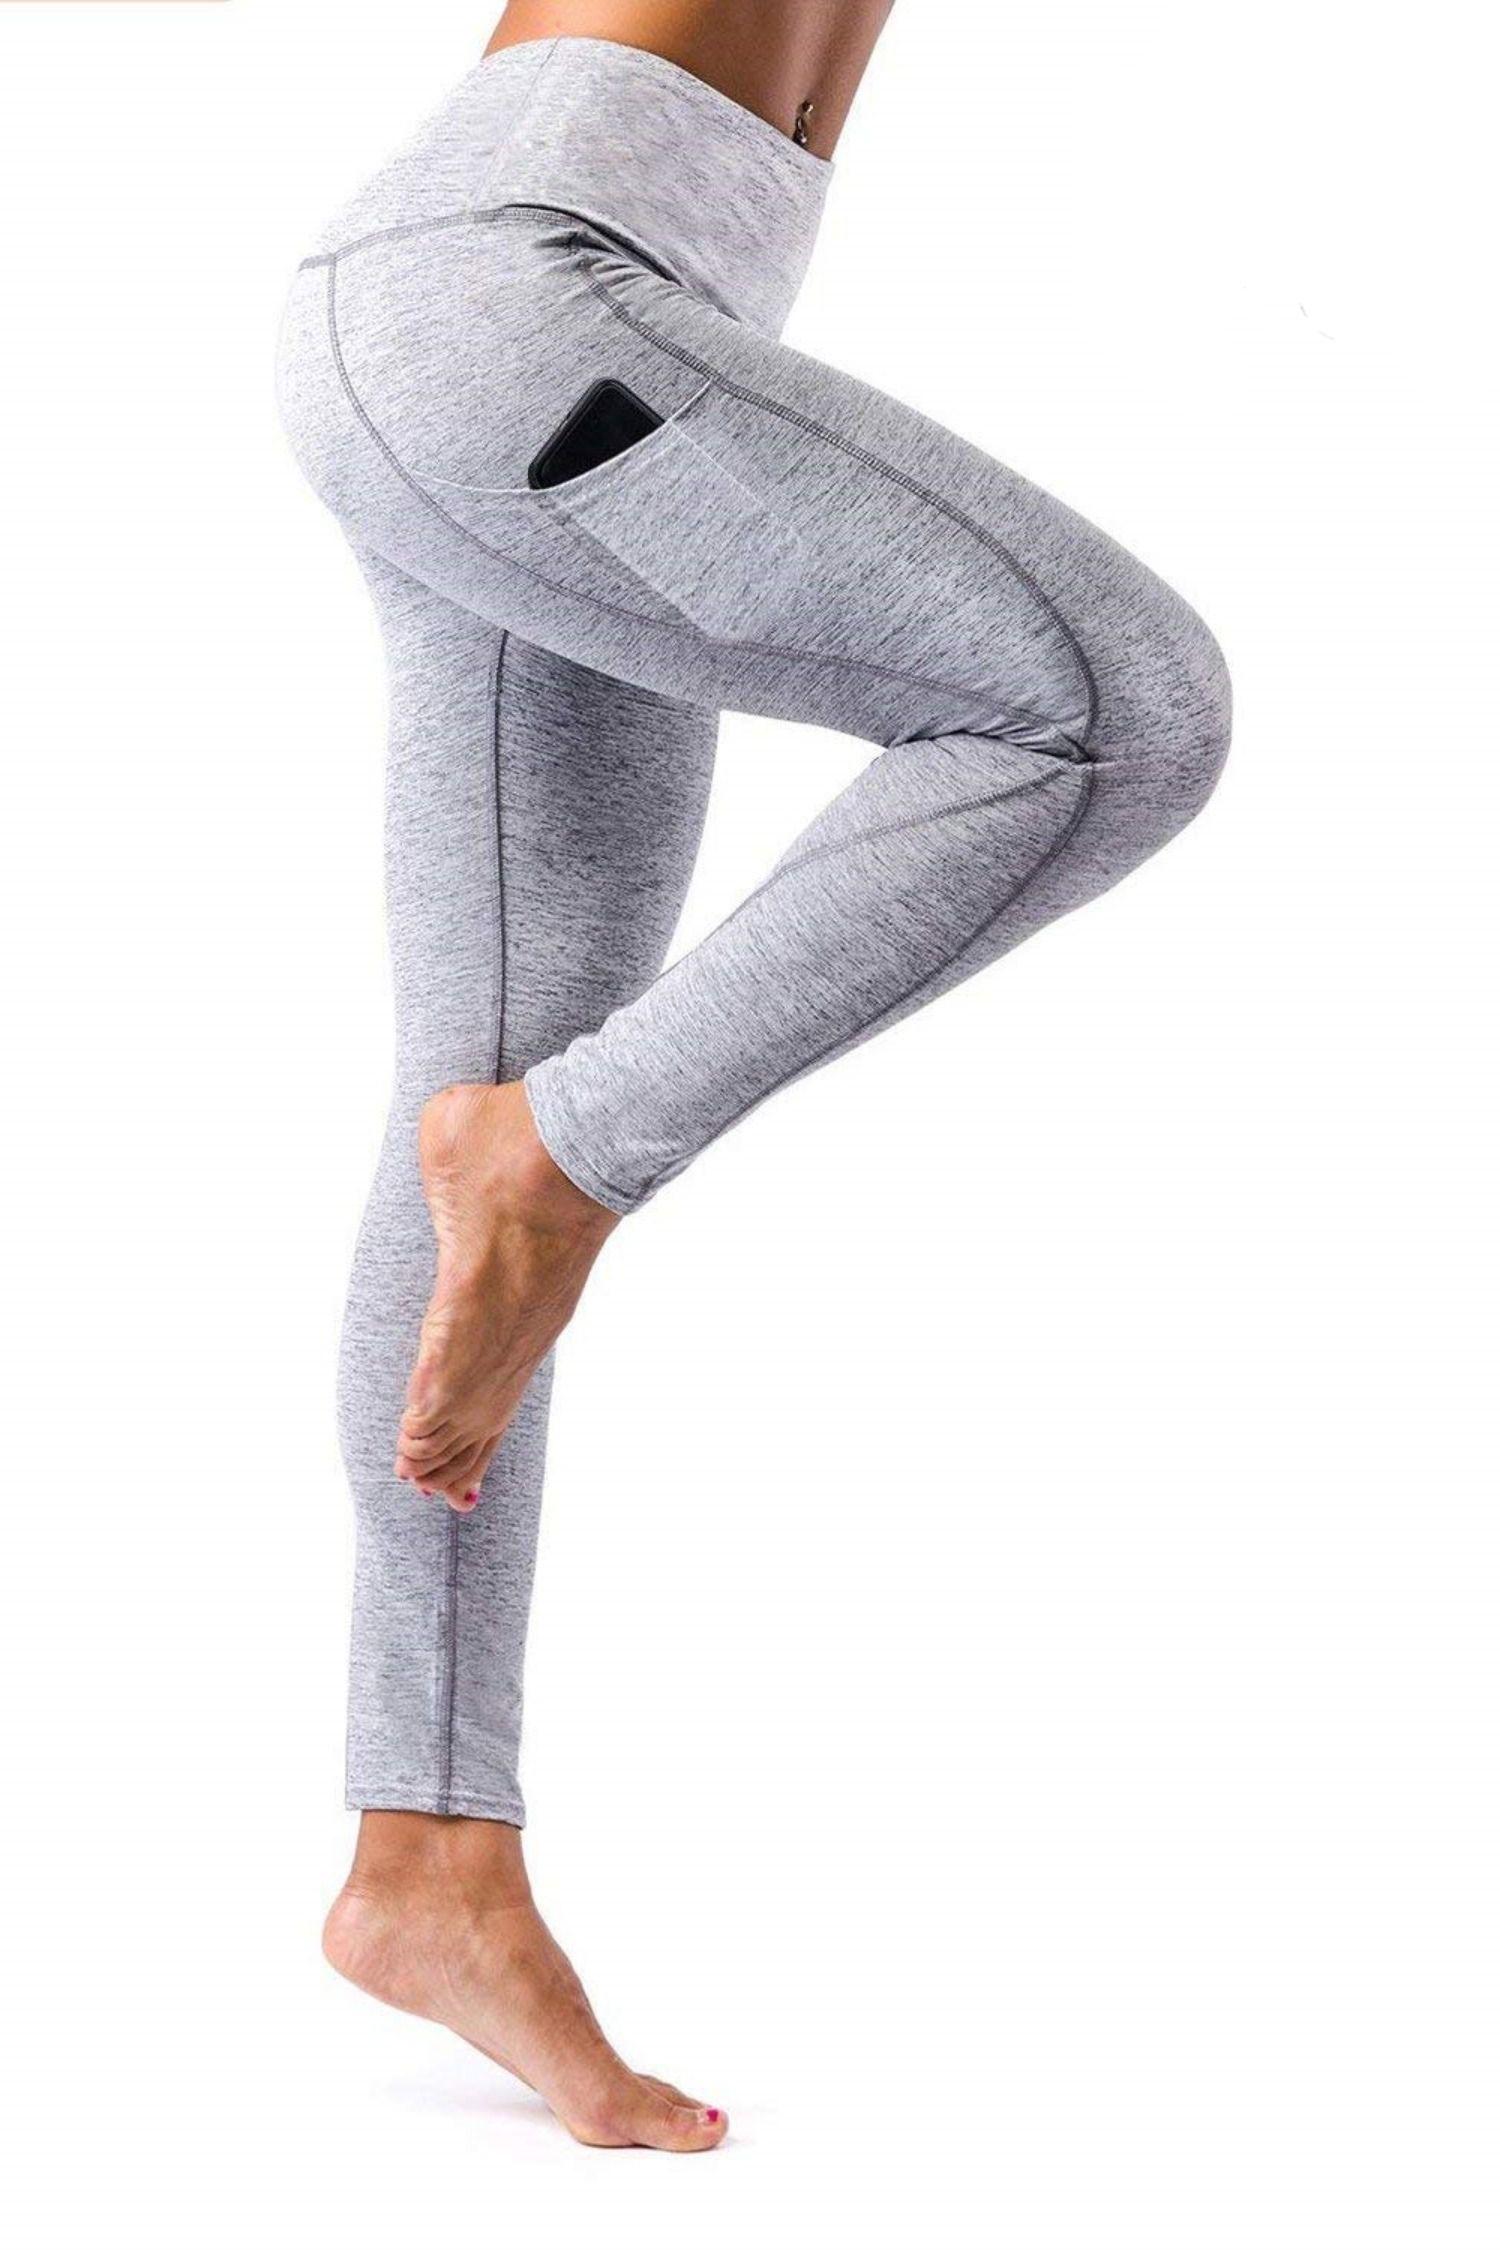 Yogipace Petite Tall Womens 31 34 High Rise Mid Rise Goddess Extra Long Leggings Yoga Over The Heel Leggings Formtech Inc Com